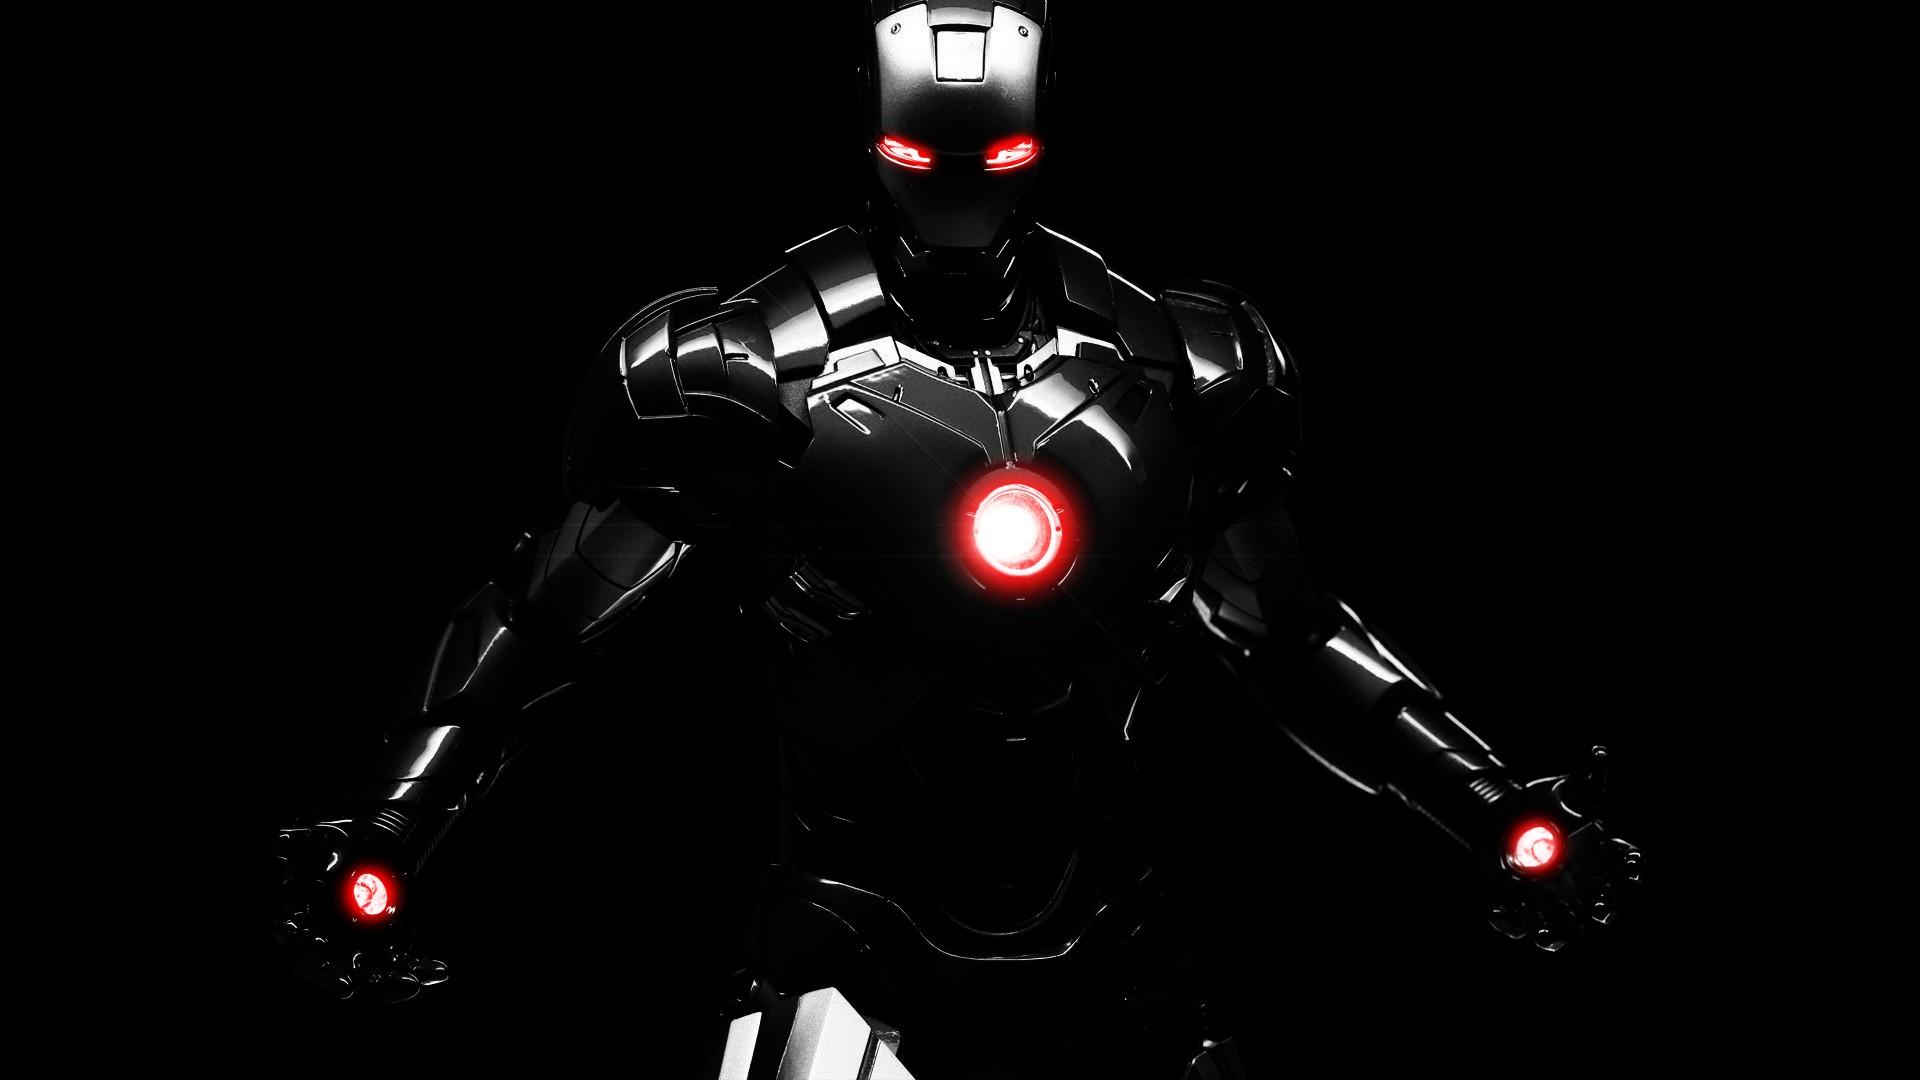 Iron Man Hd Wallpaper Hintergrund 1920x1080 Id401566